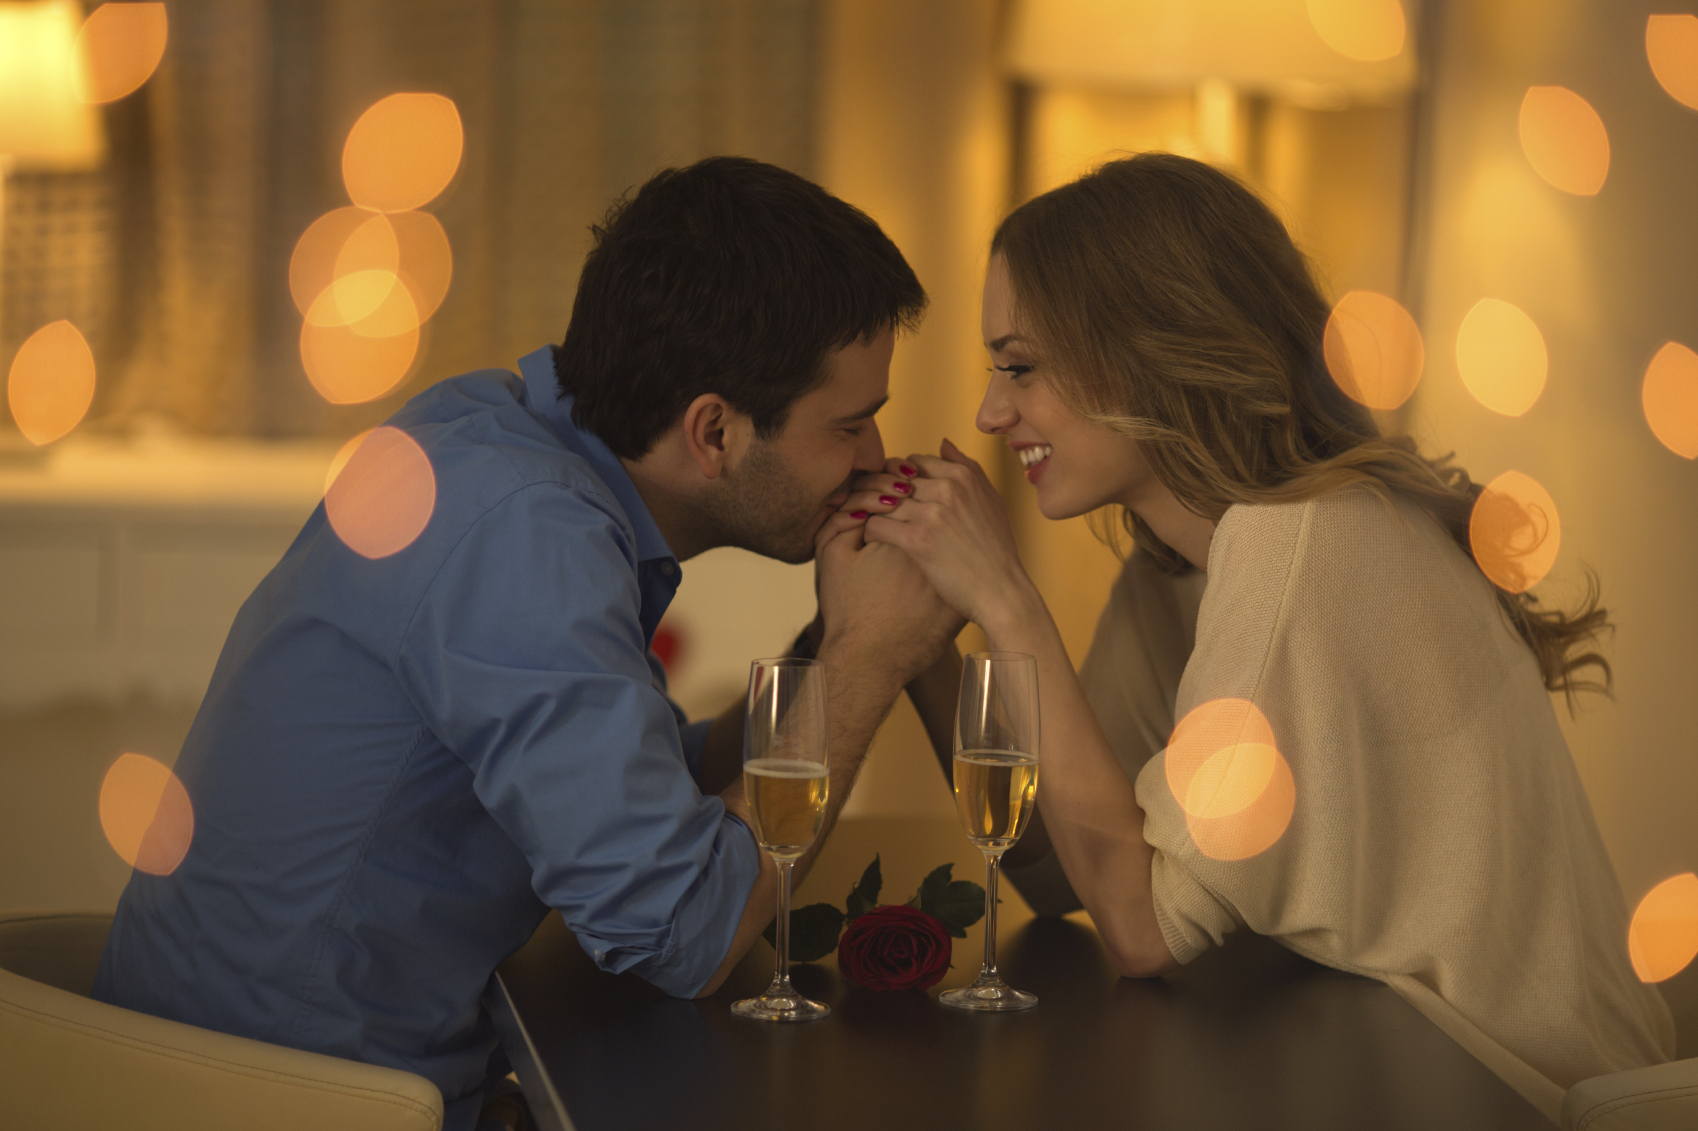 1-za-samo-30-sekundi-navika-so-koja-kje-ja-vratite-zaljubenosta-od-pochetokot-na-ljubovnata-vrska-www,kafepauza.mk_